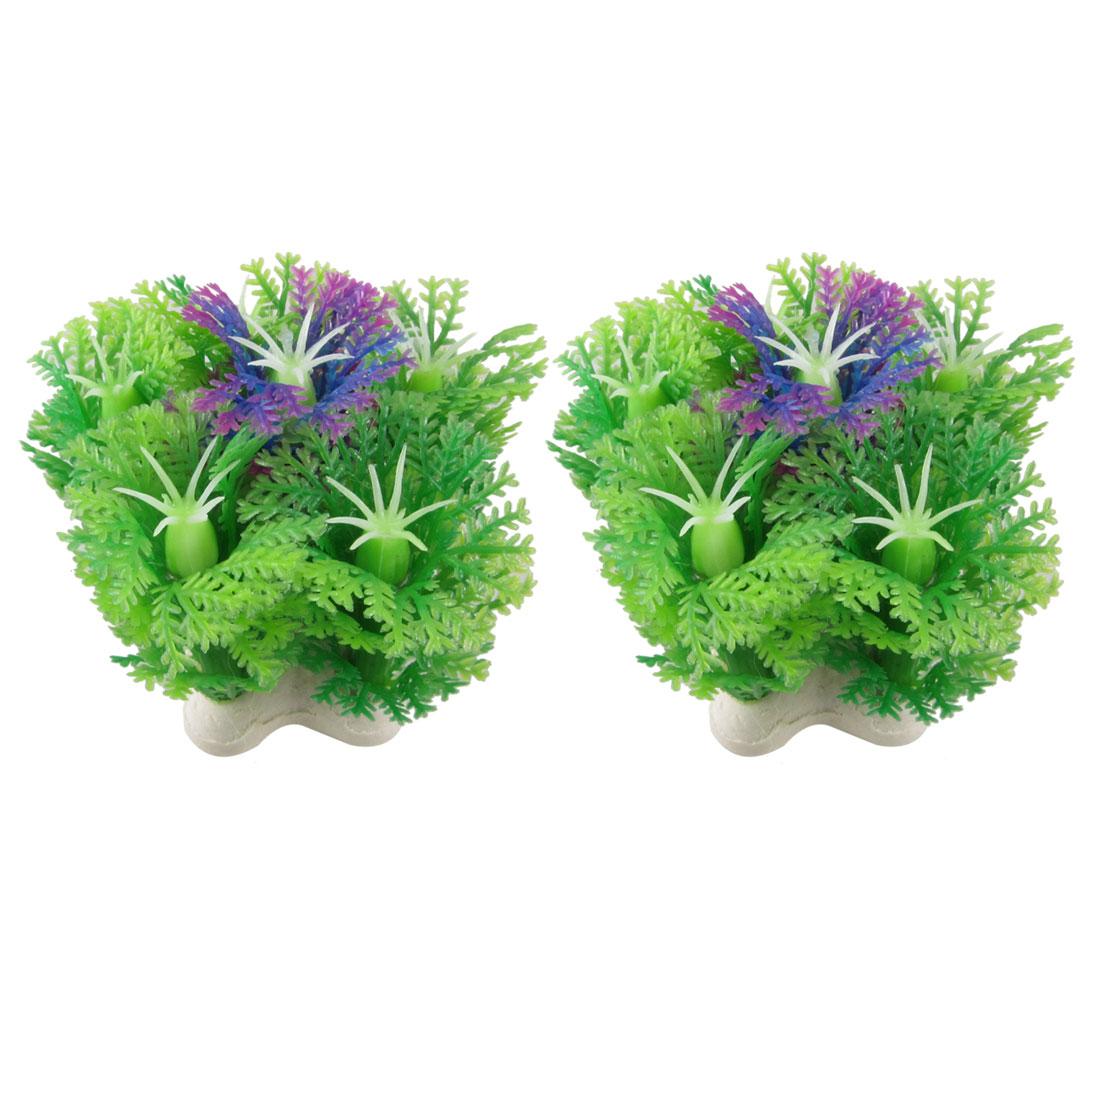 "2 Pcs Simulated Green Purple Plastic Plant Aquarium Fish Tank Ornament 2.4"""